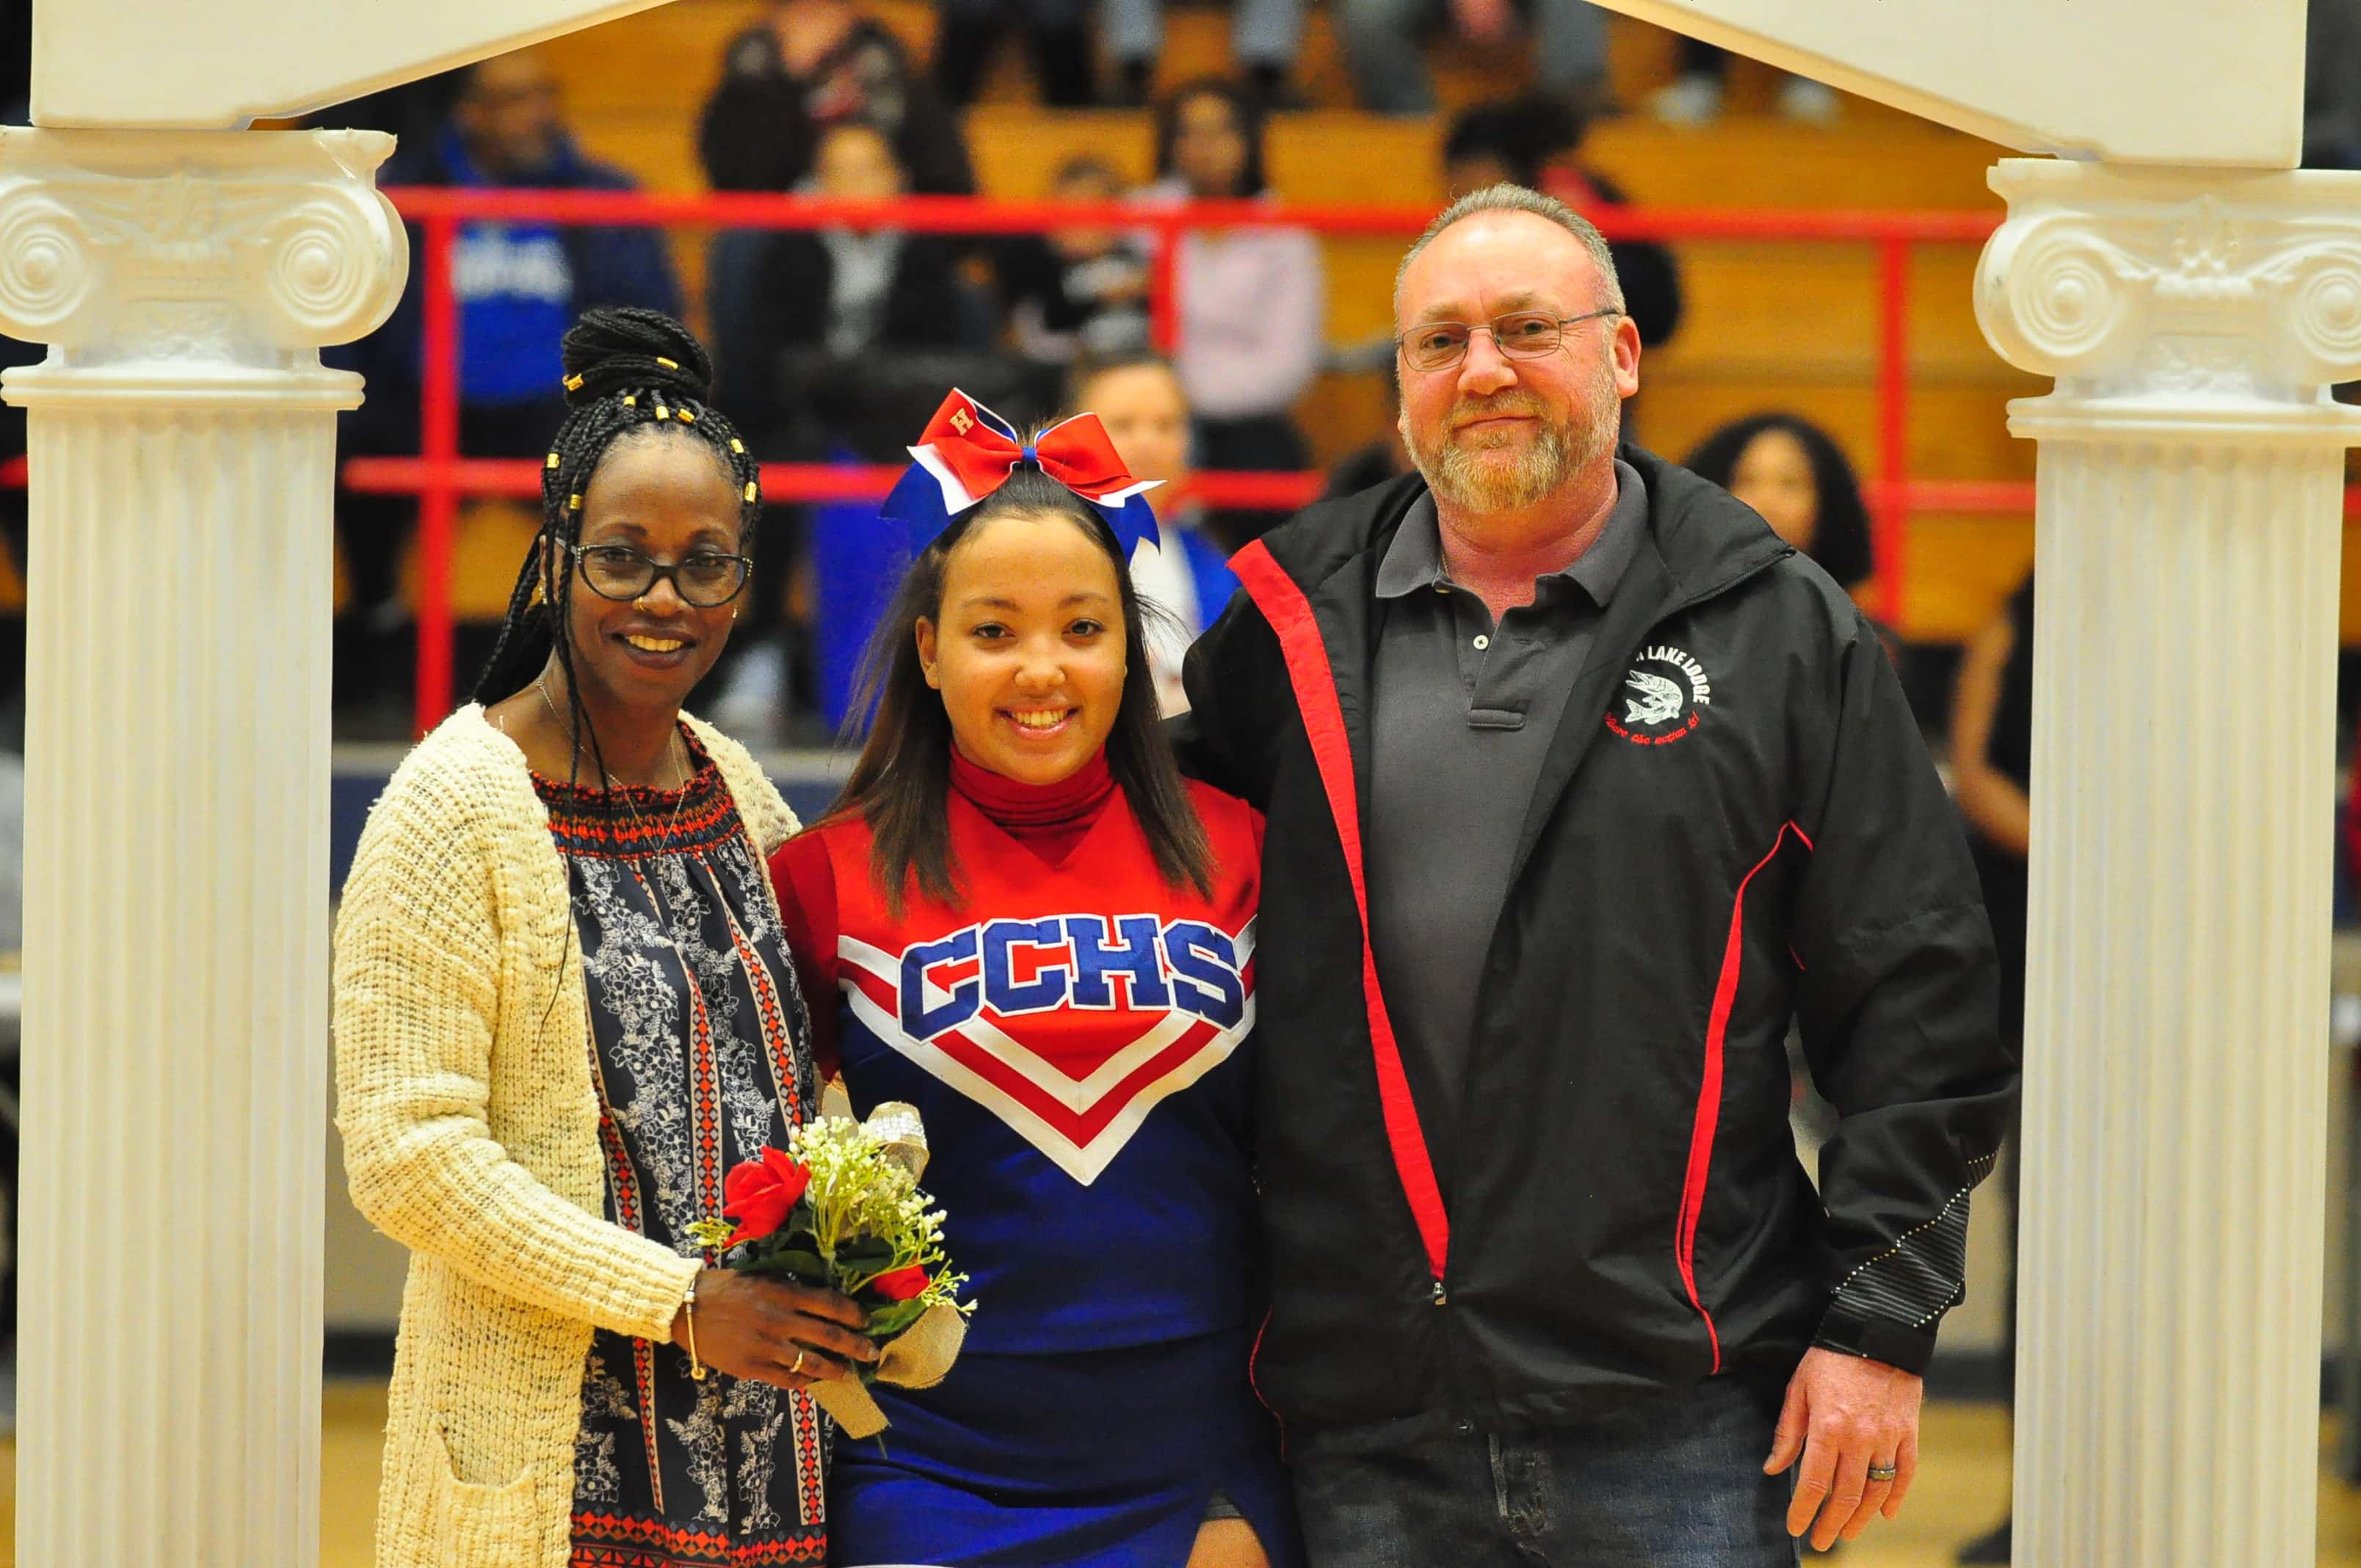 Christian County Girls Basketball Senior Night